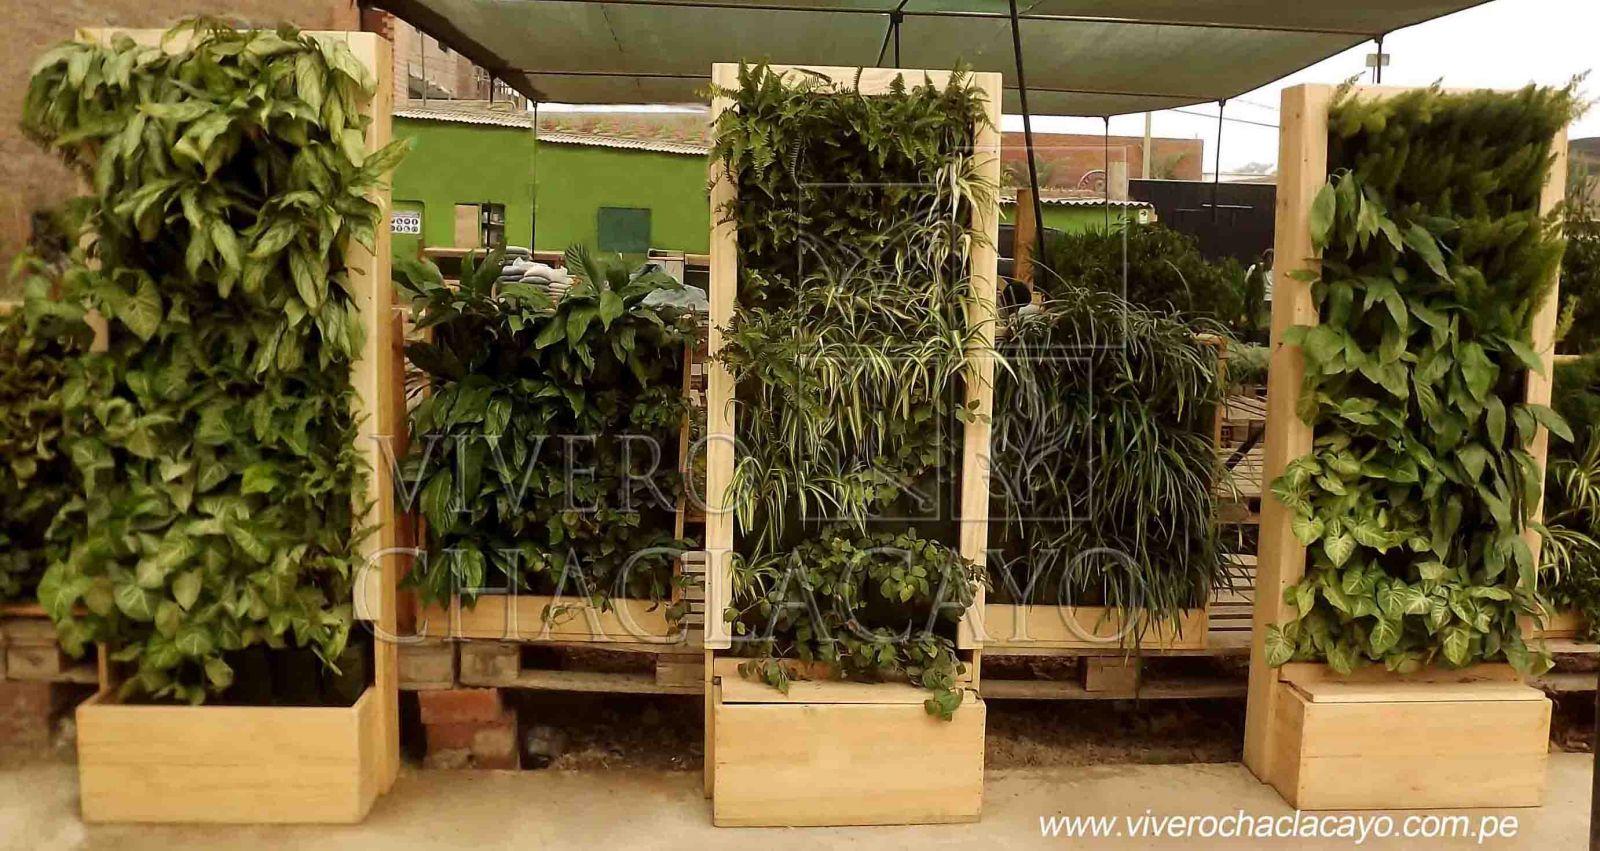 muros vegetales vivero chaclacayo